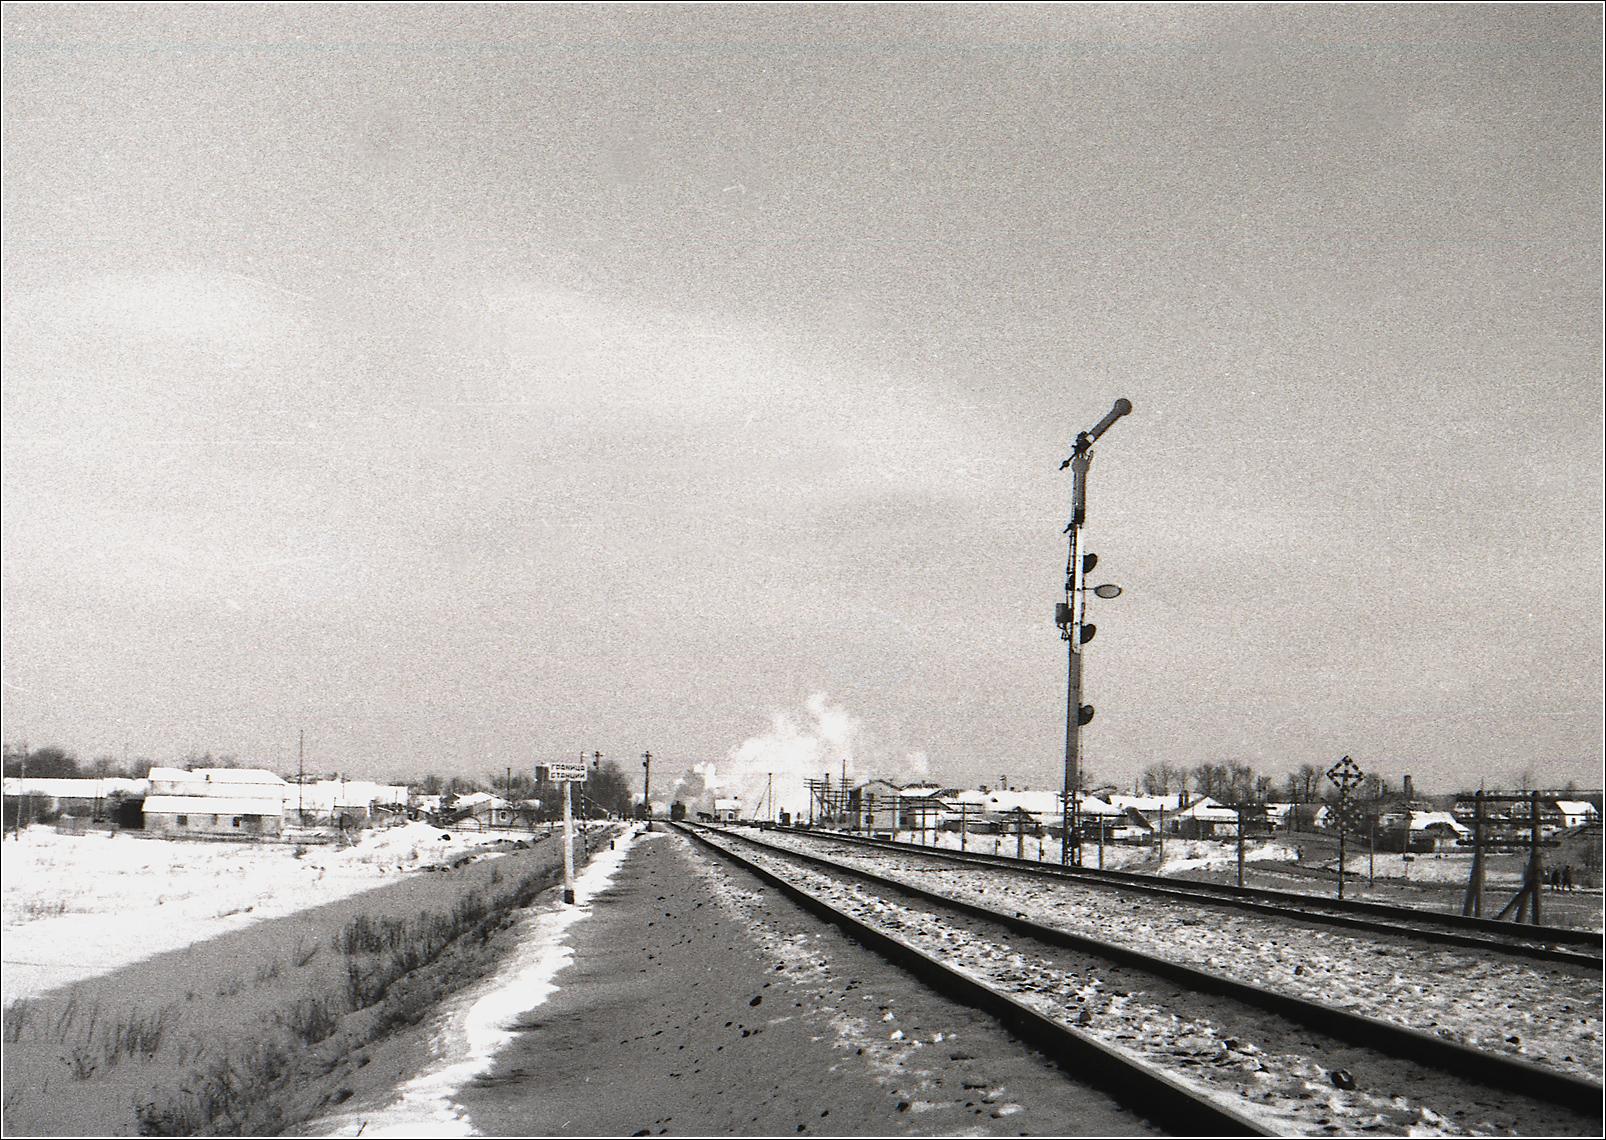 07. 1960. Деражня. Граница станции